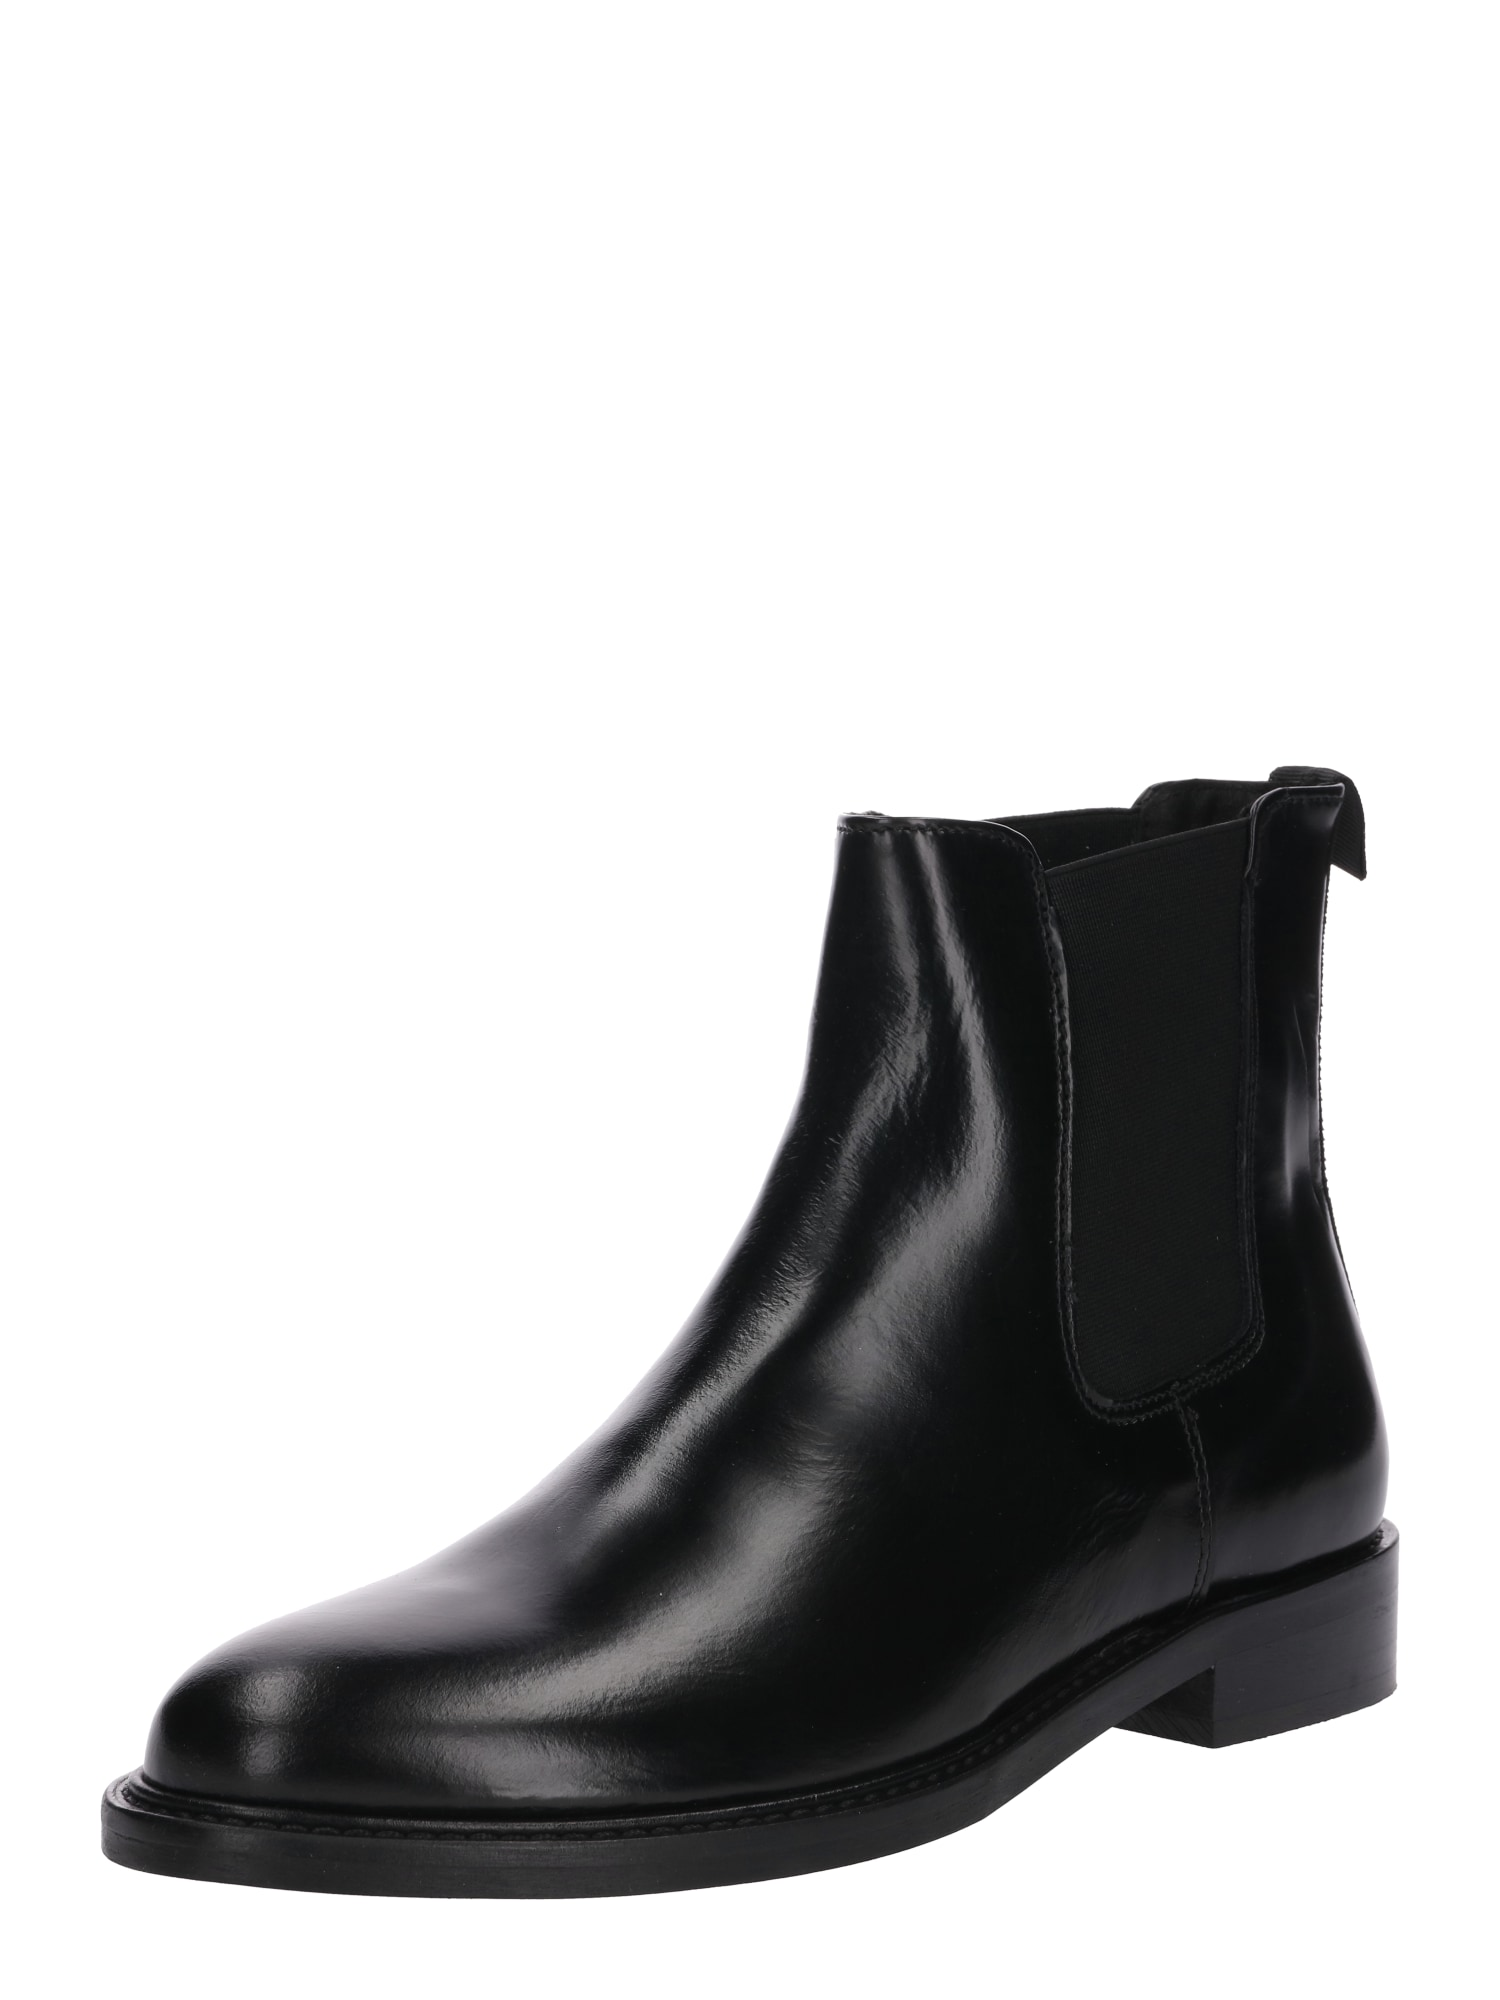 Chelsea boty RIKO černá Samsoe & Samsoe